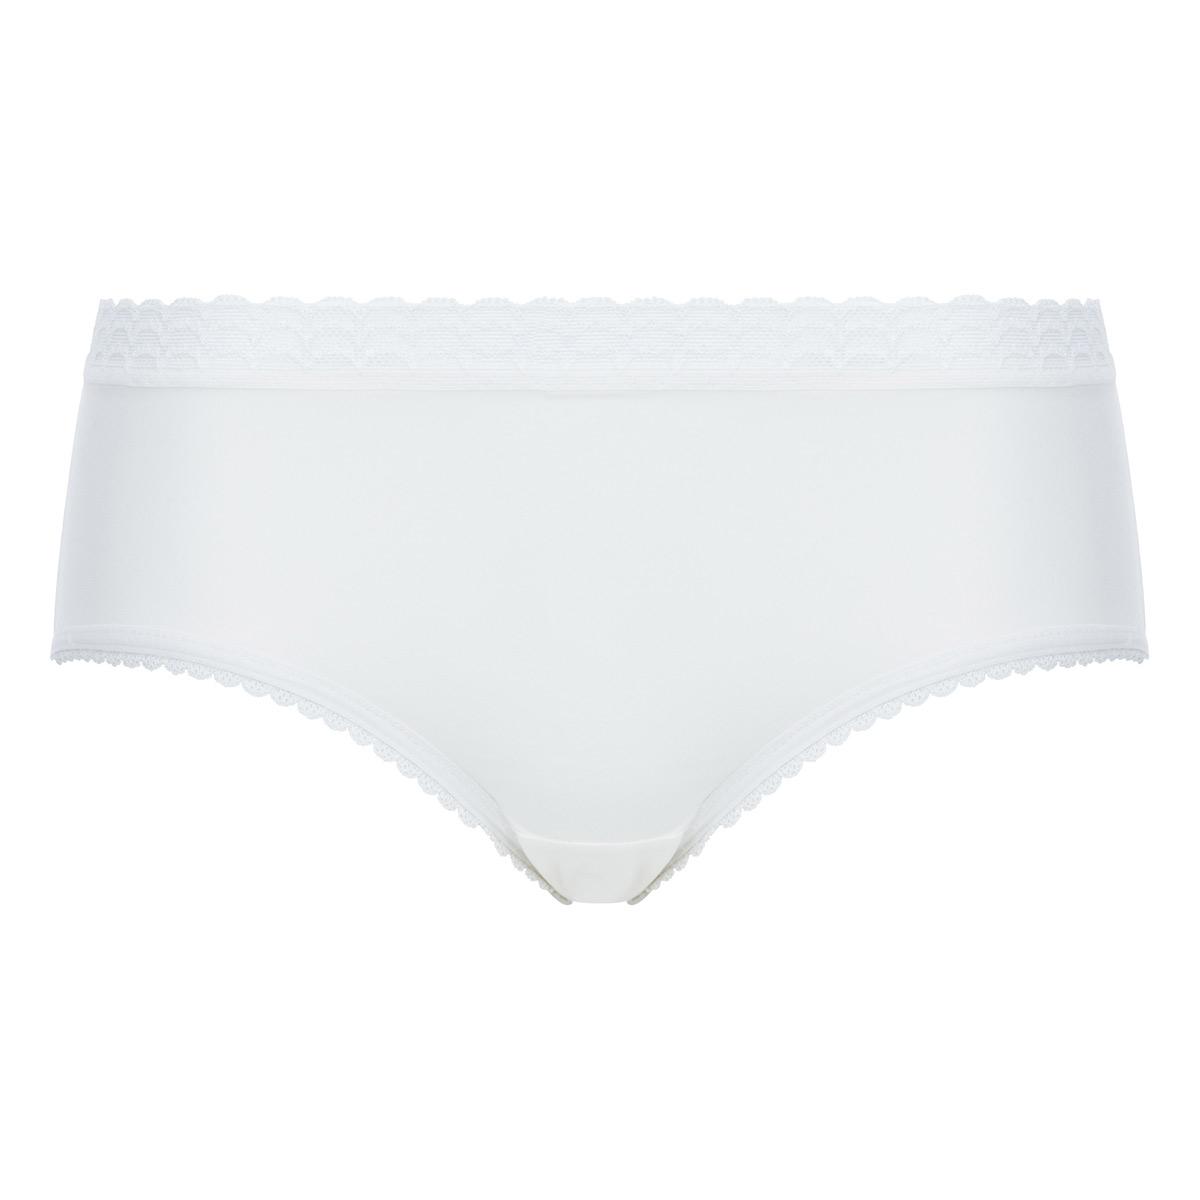 Braga alta midi blanco marfil - Invisible Elegance, , PLAYTEX